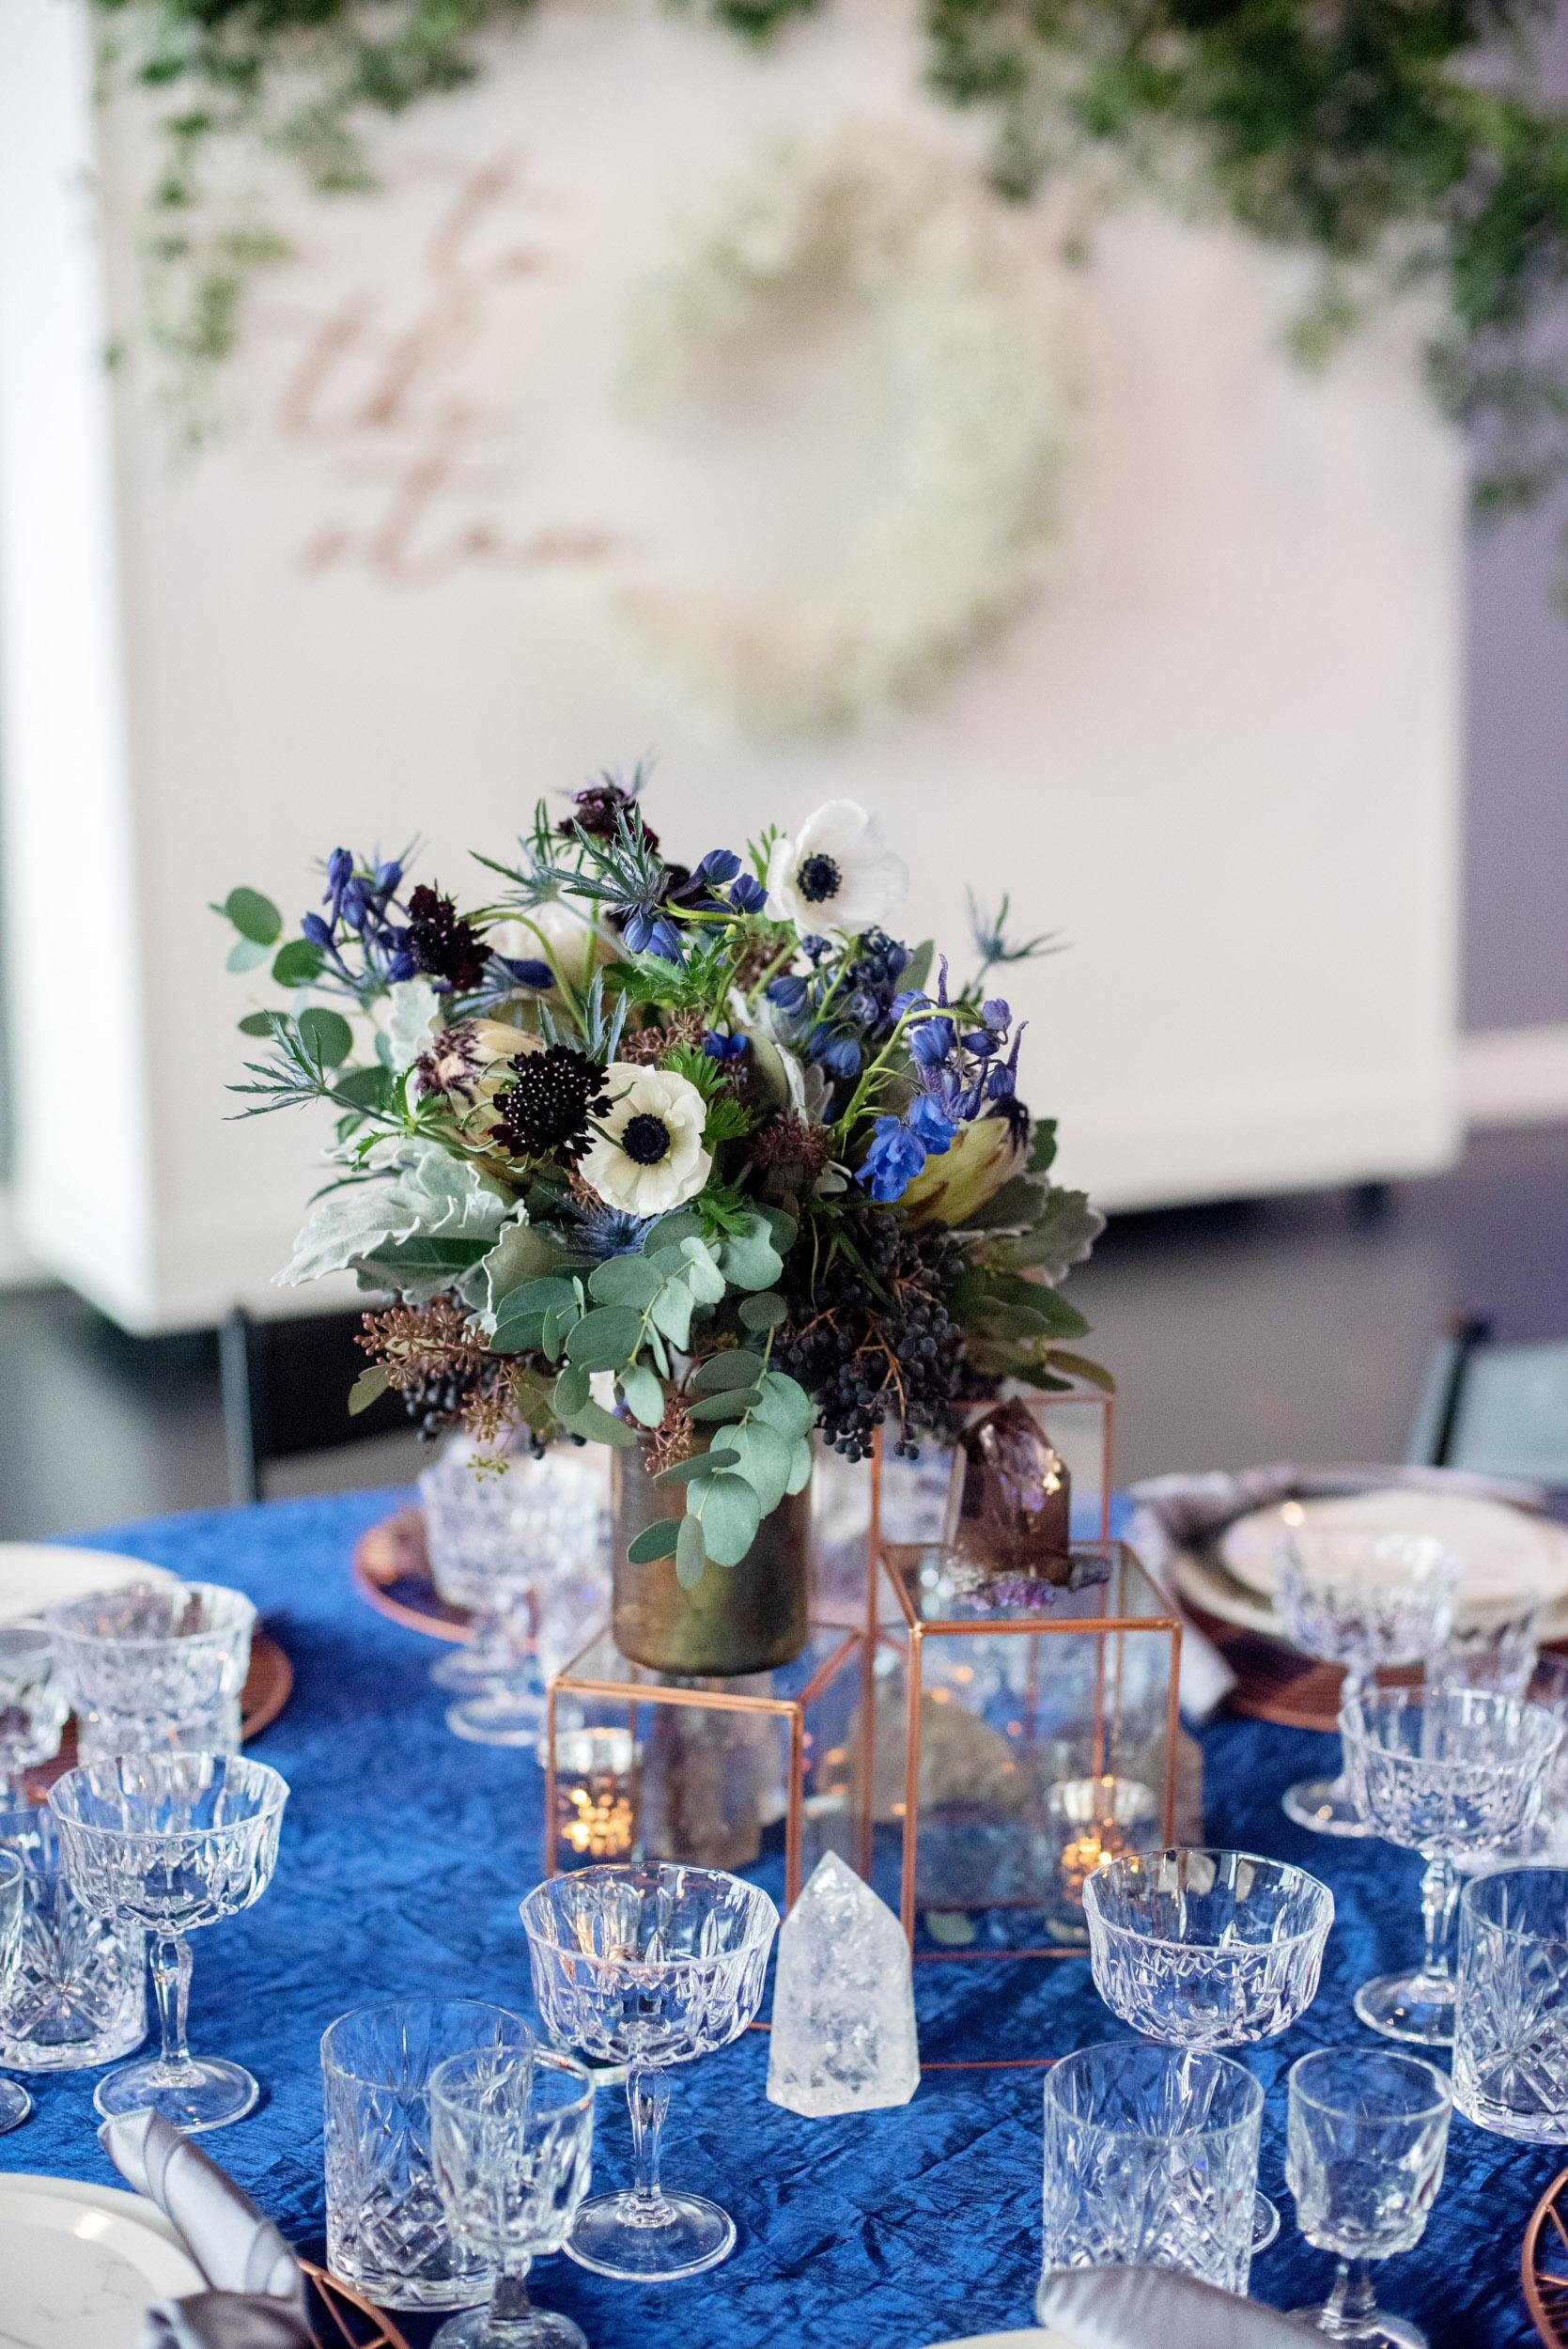 white and black anemone, white anemone, celestial wedding, tablescape, wedding ideas, wedding flowers, altar flowers, blue wedding